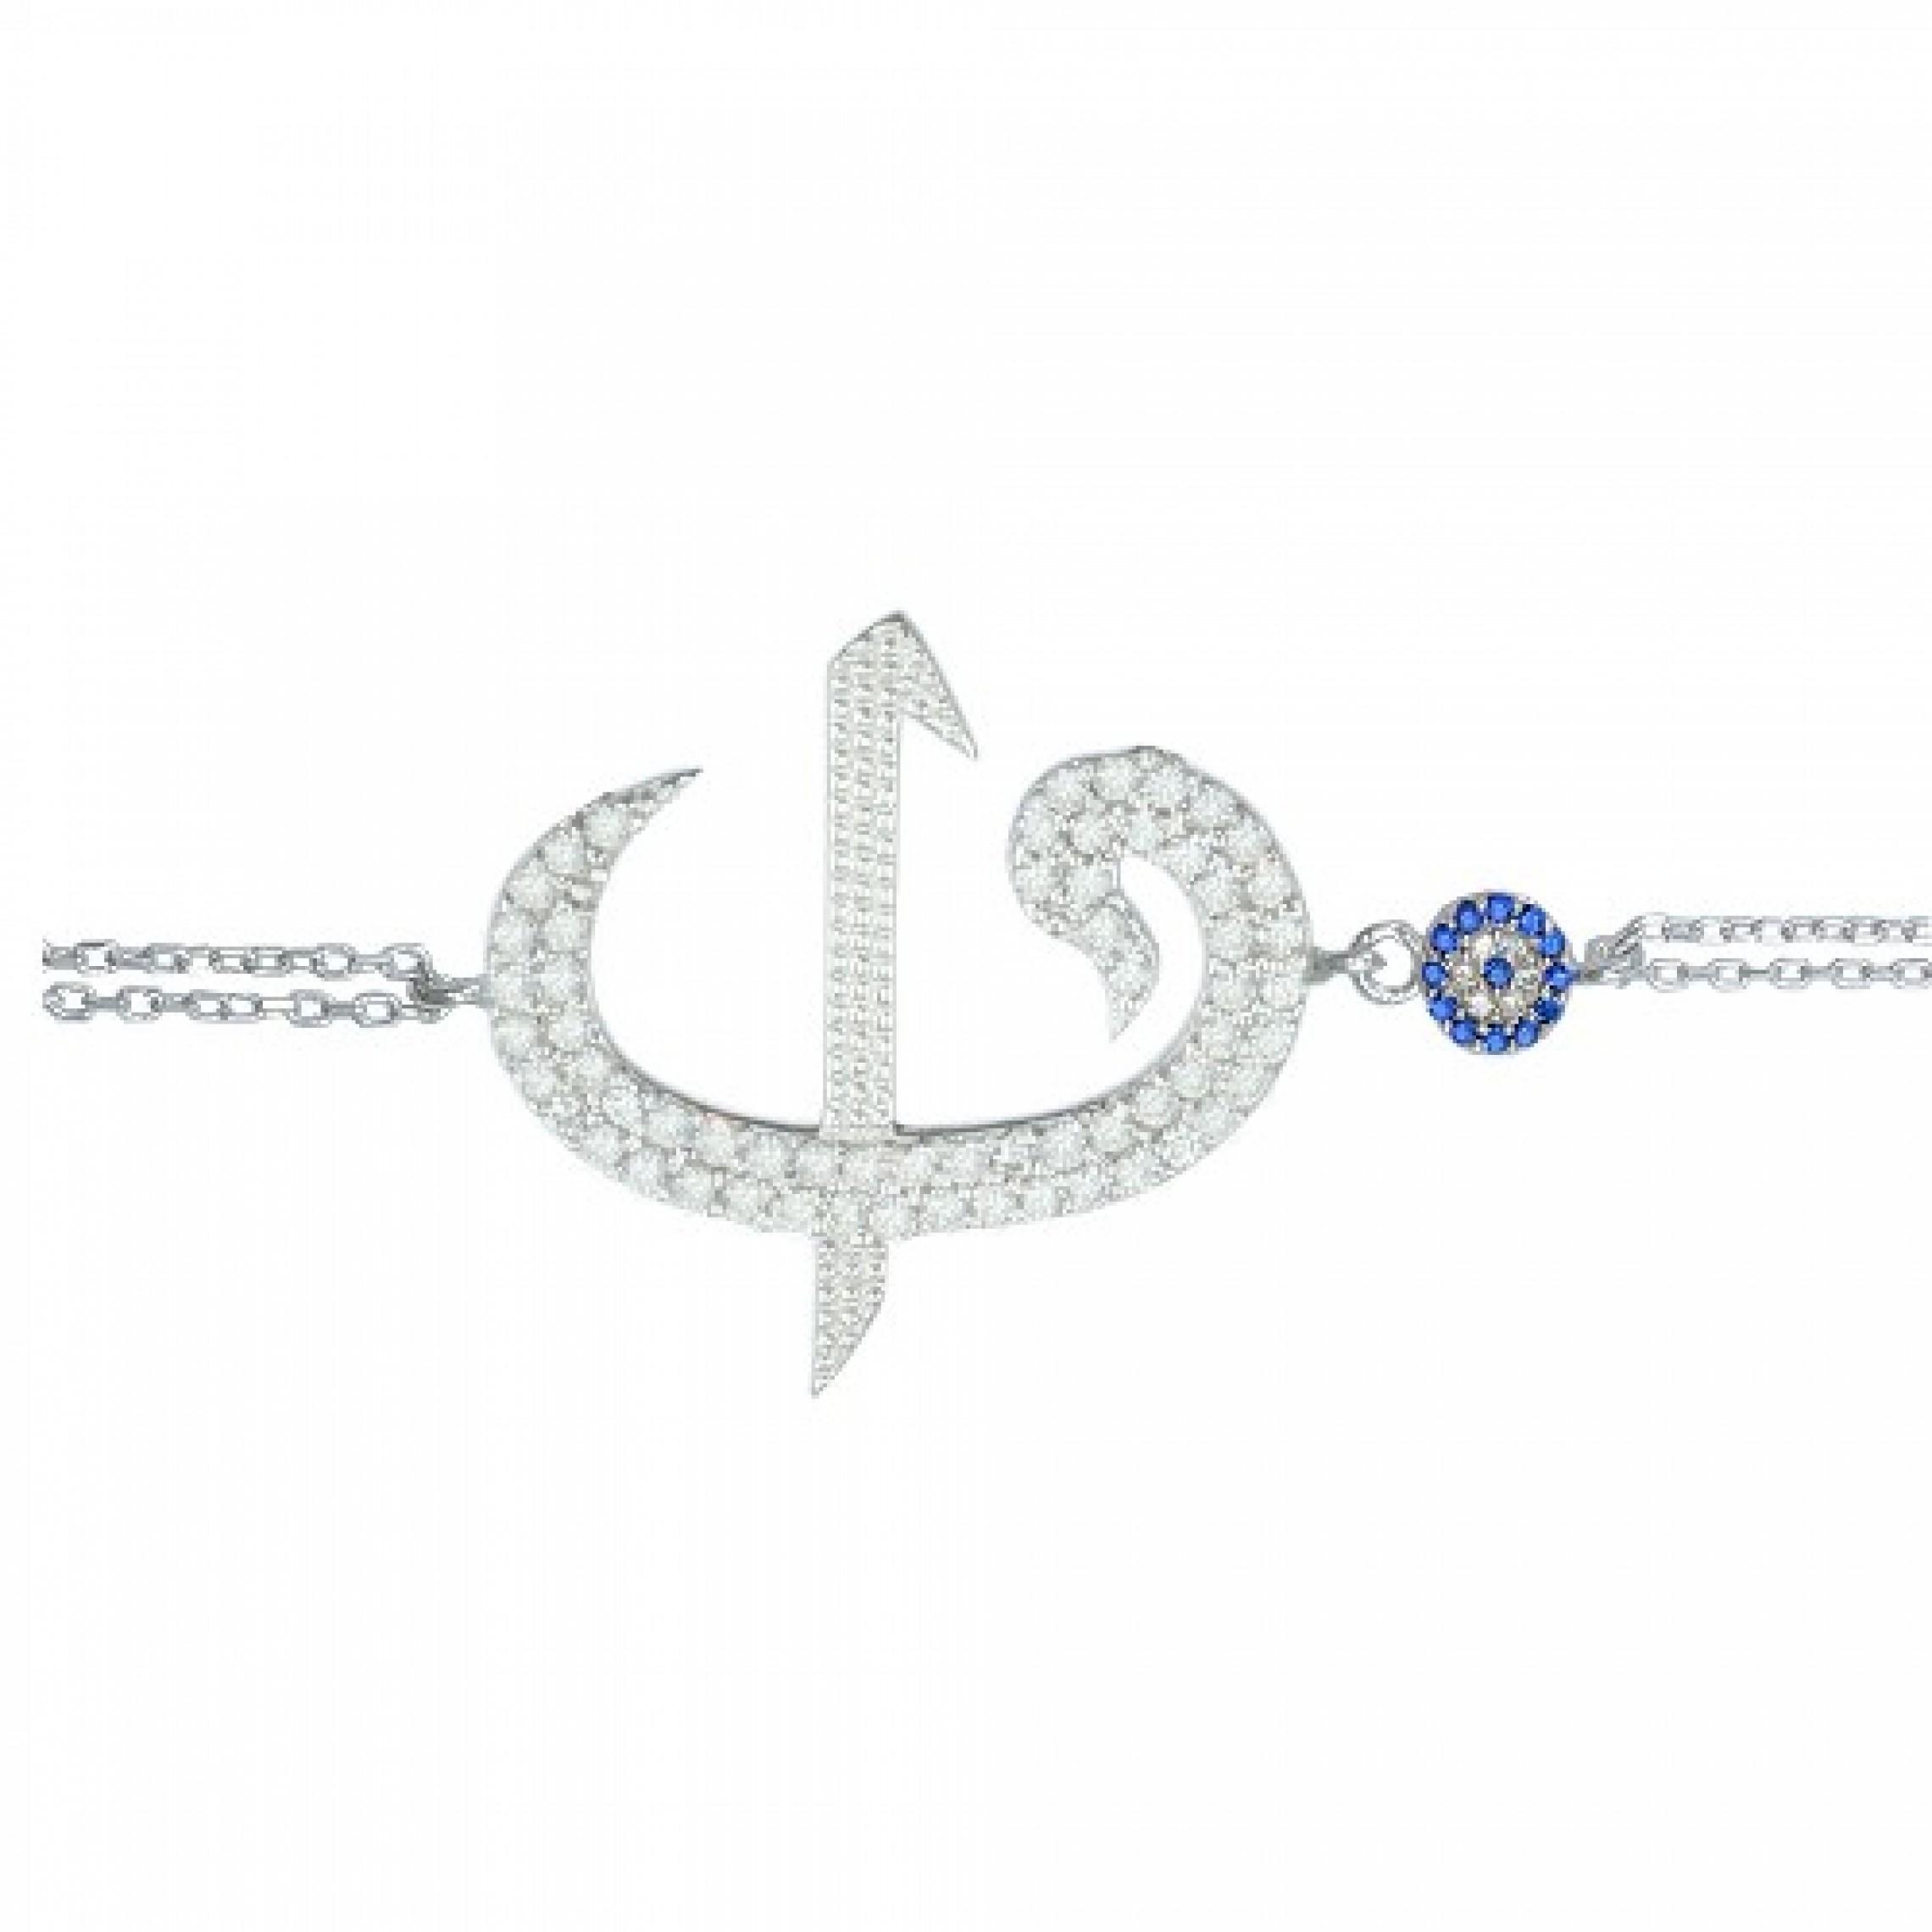 SB-4 Evil Eye 925 Sterling Silver CZ Bracelet